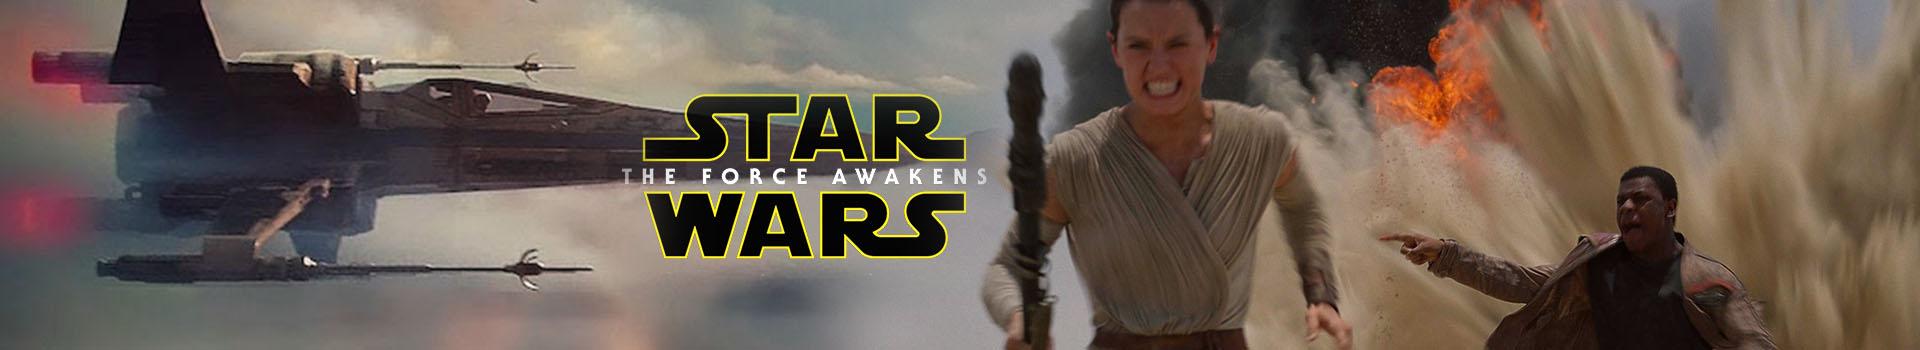 Star Wars - The Force Awakens Merchandise